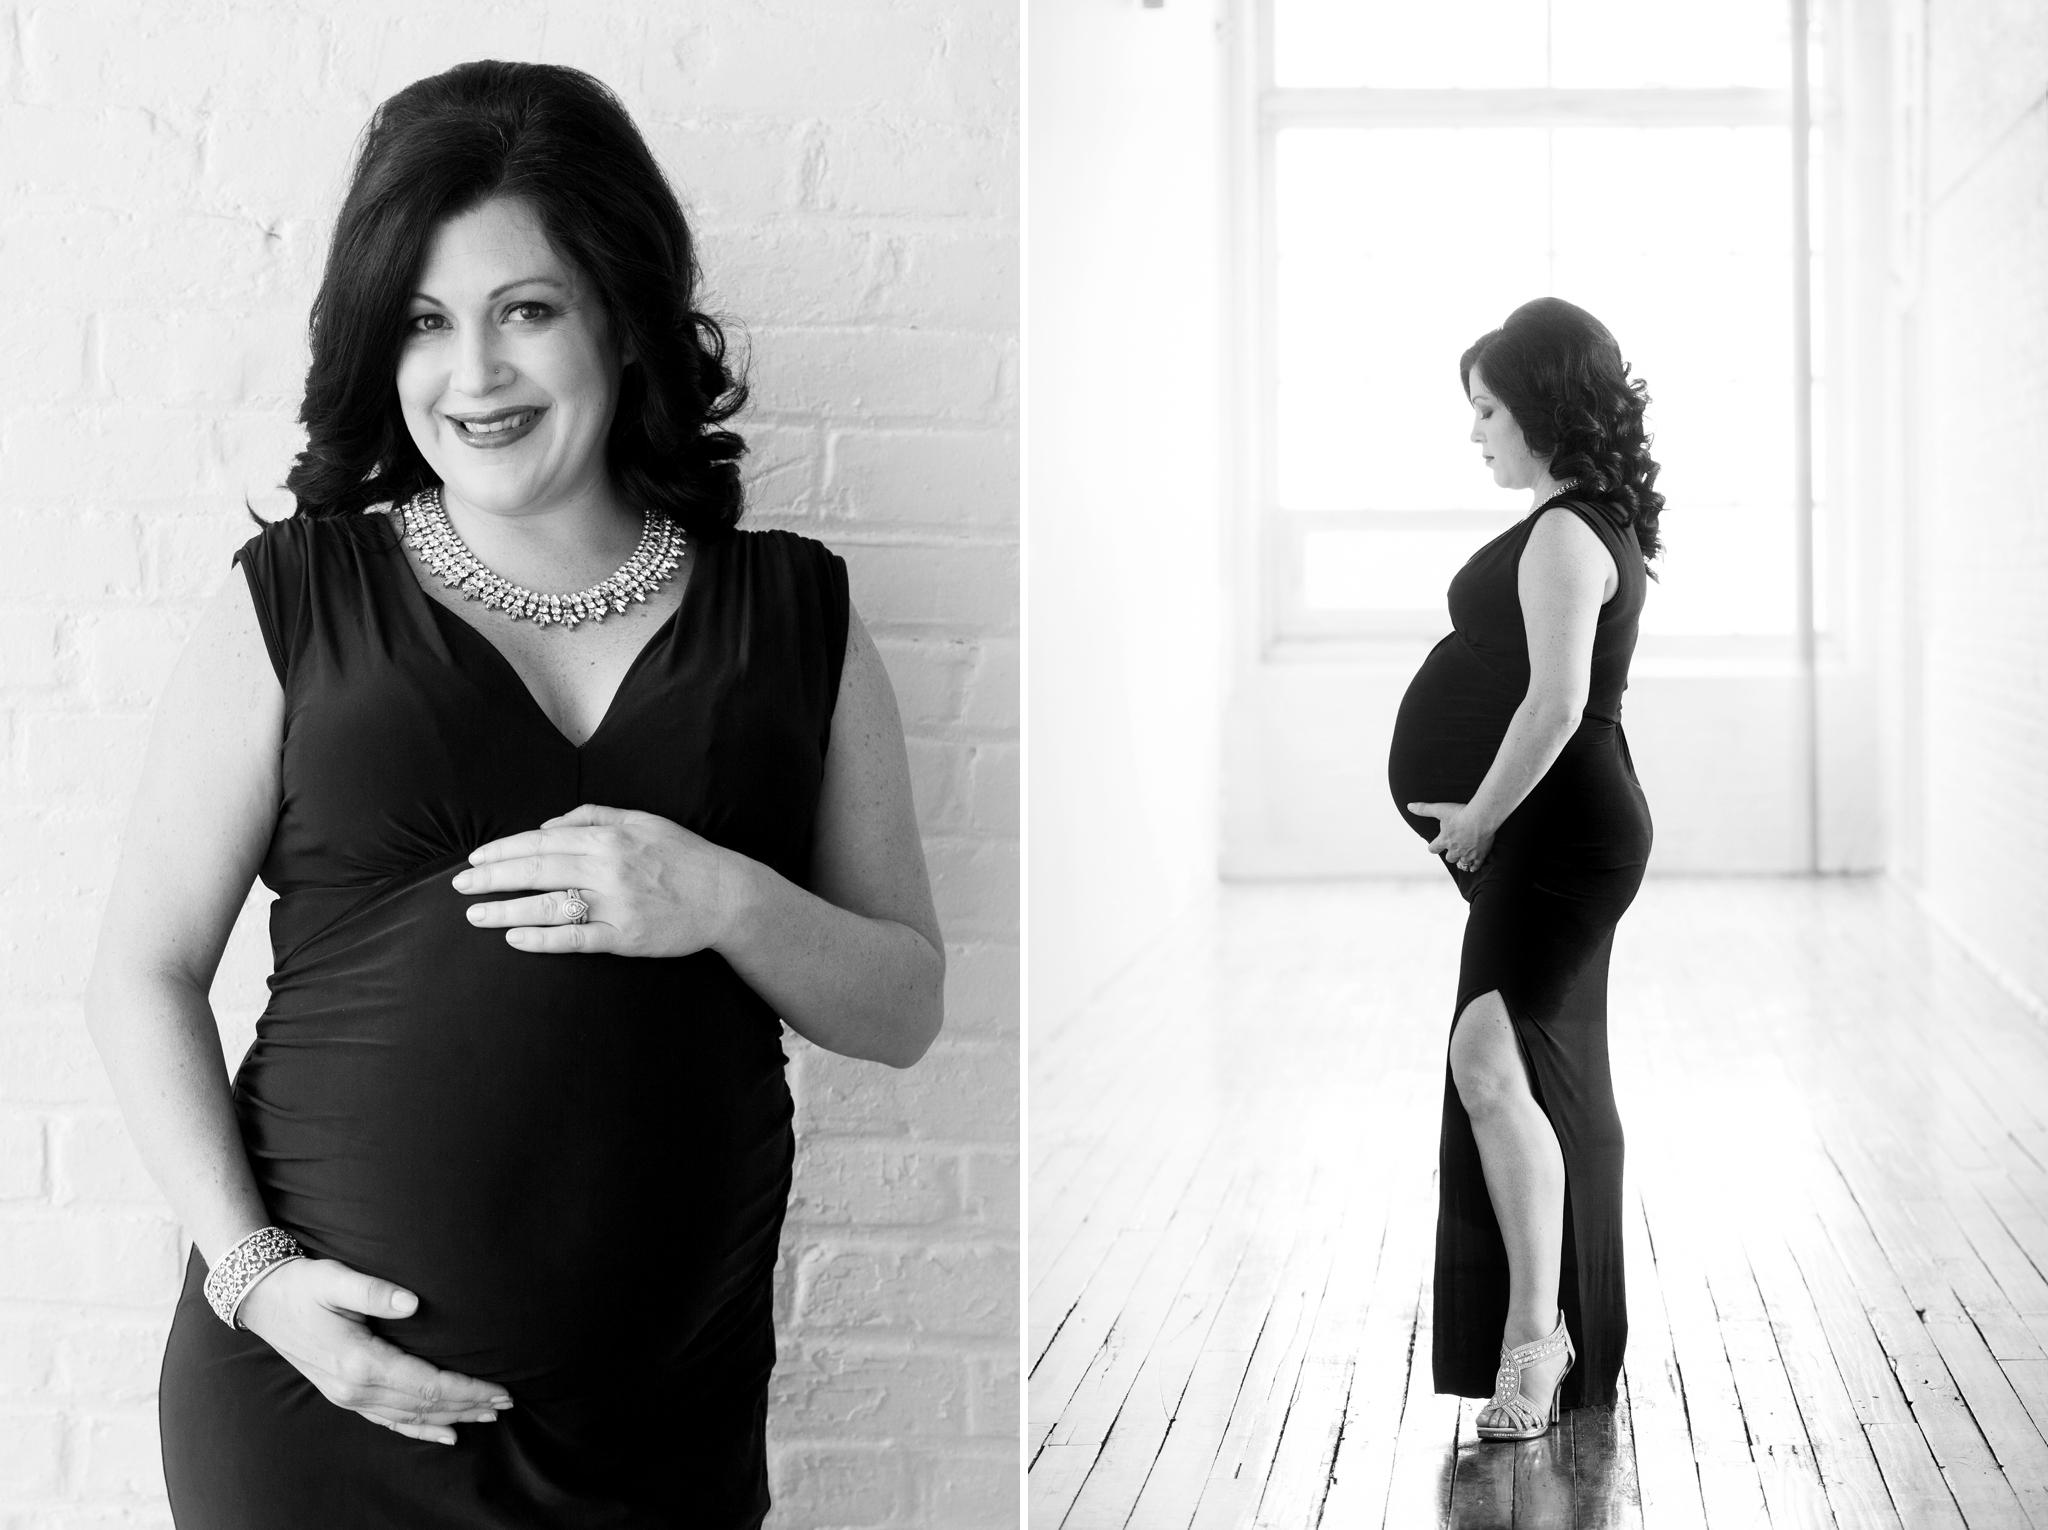 MaternityPhotography_BlackAndWhite_MichelleGirardPhotography008.jpg